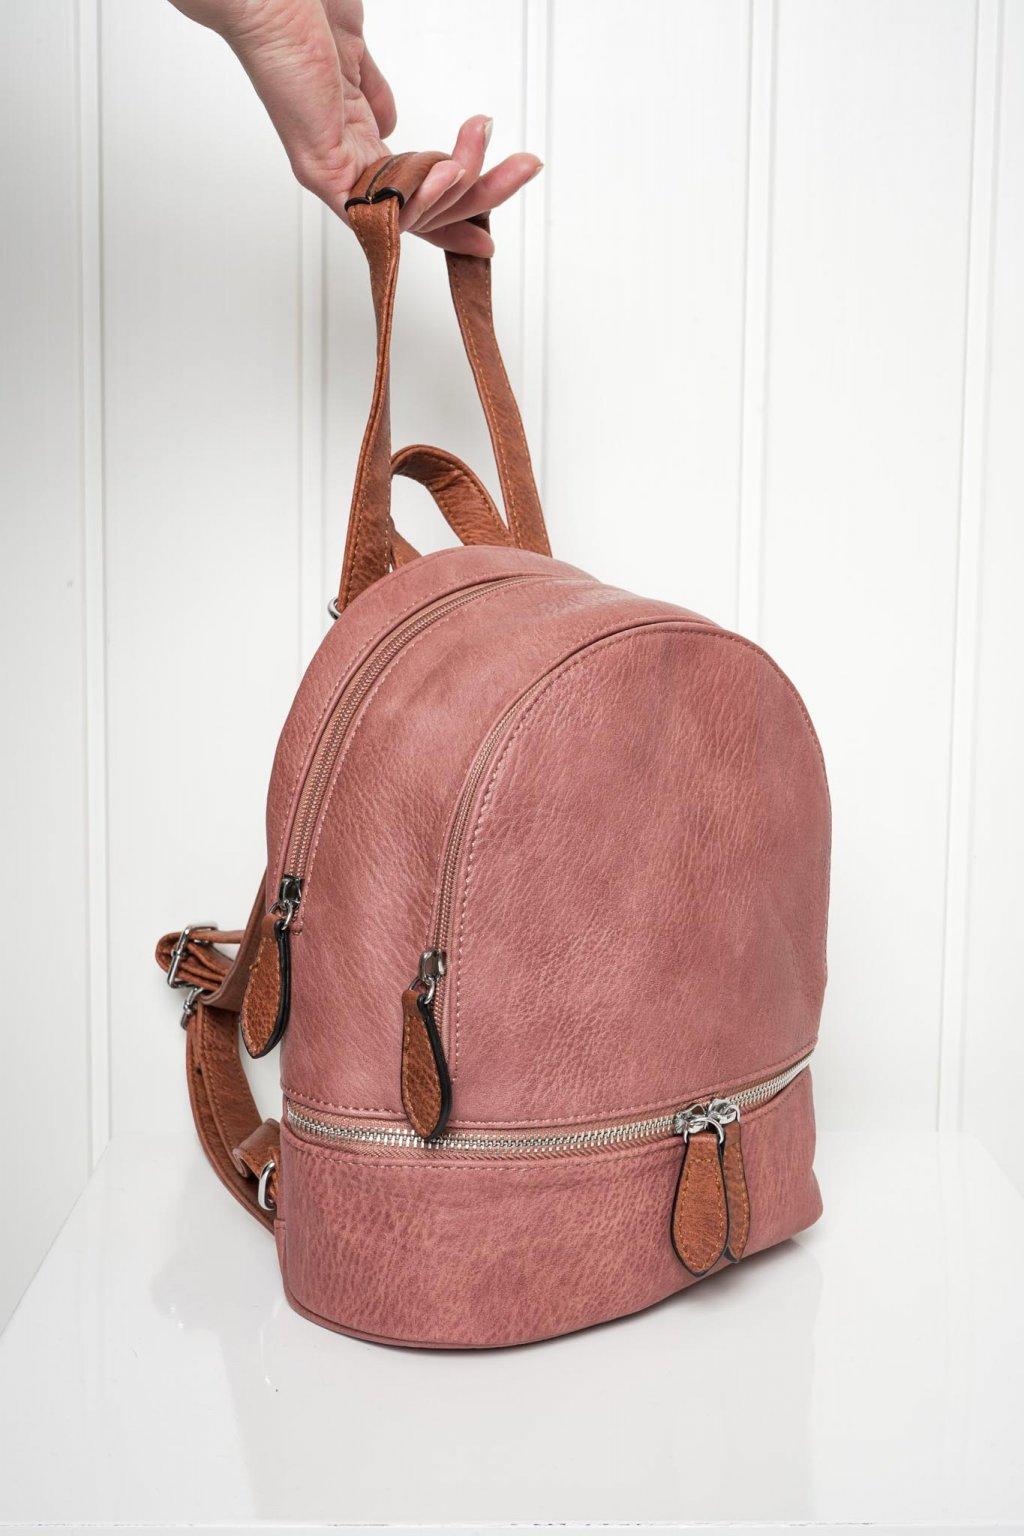 Kabelka, crossbody, ruksak, shopping bag, shopperka, 127